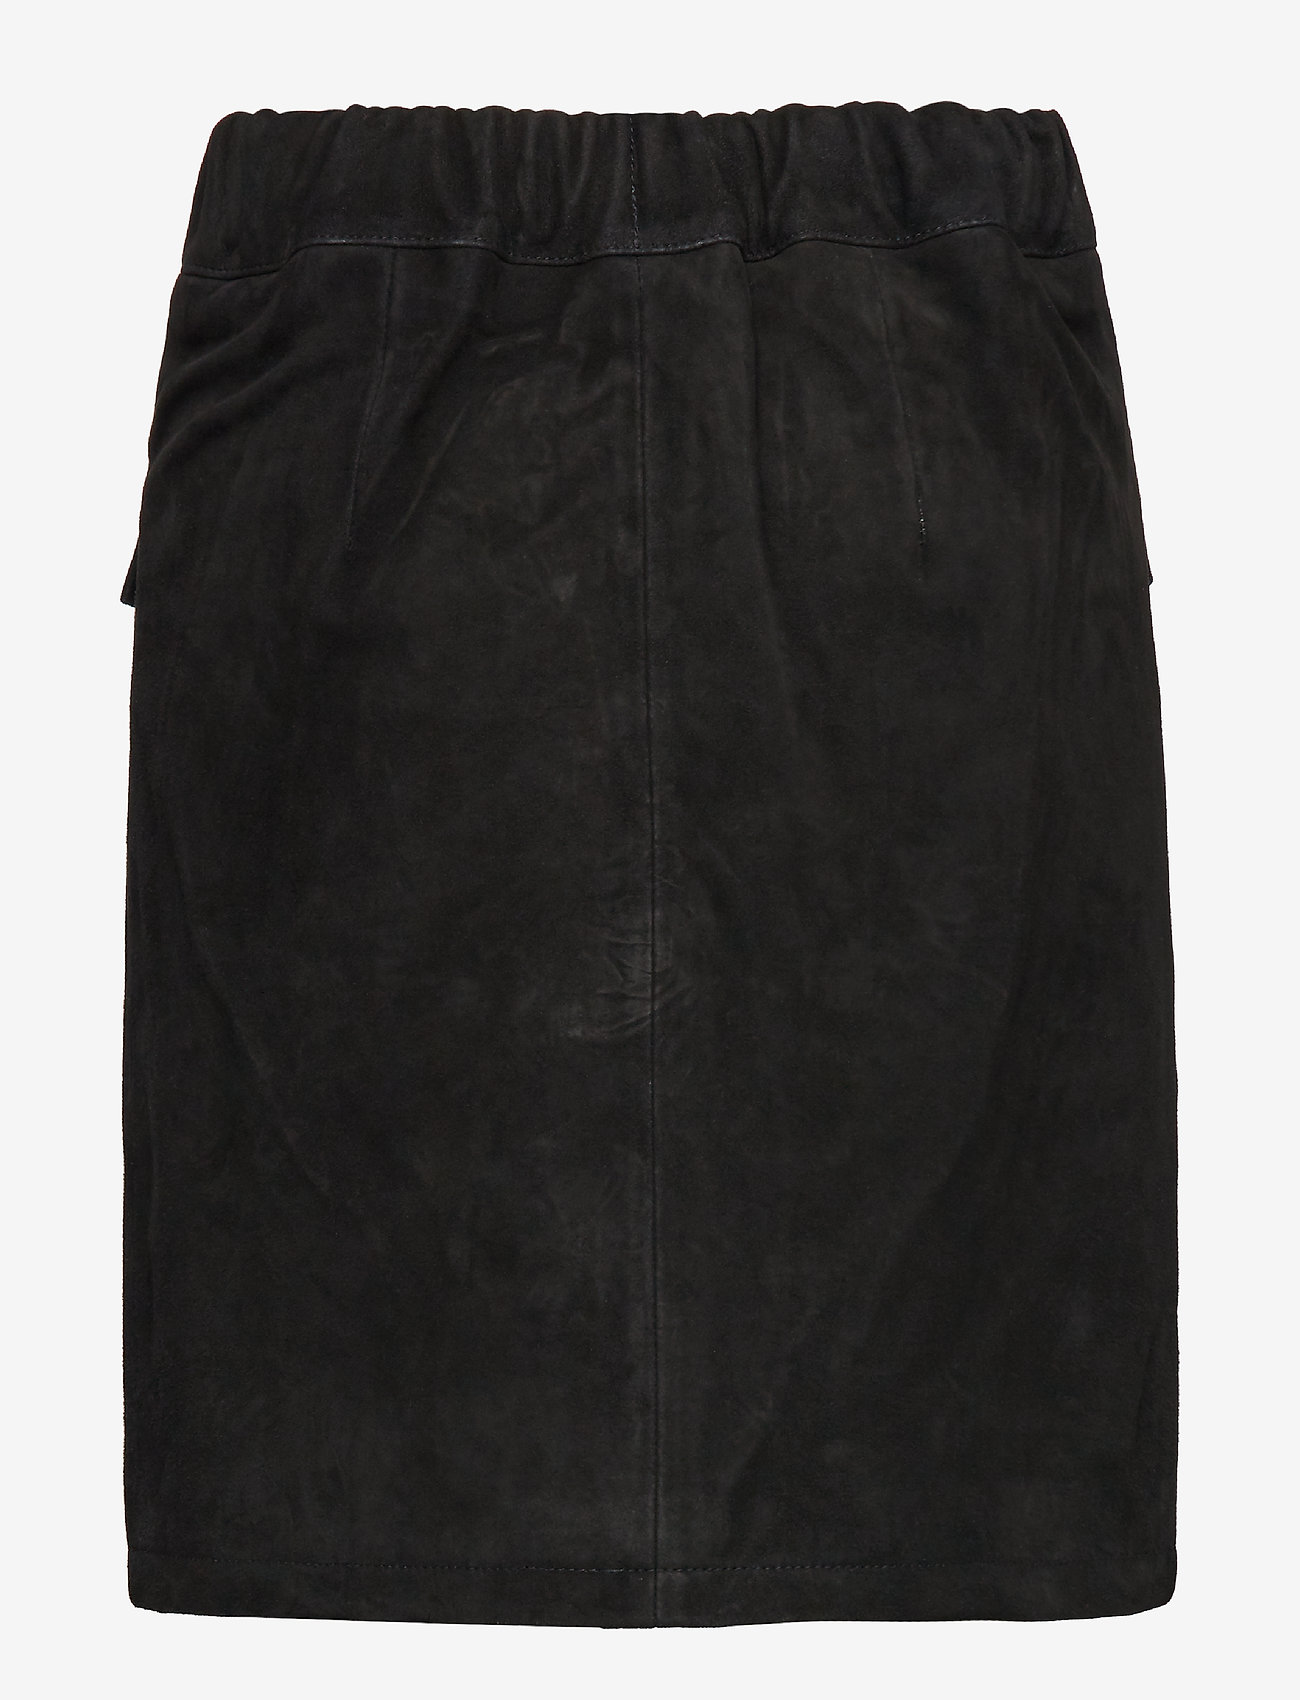 Yas Yascheer Suede Skirt - Skirts